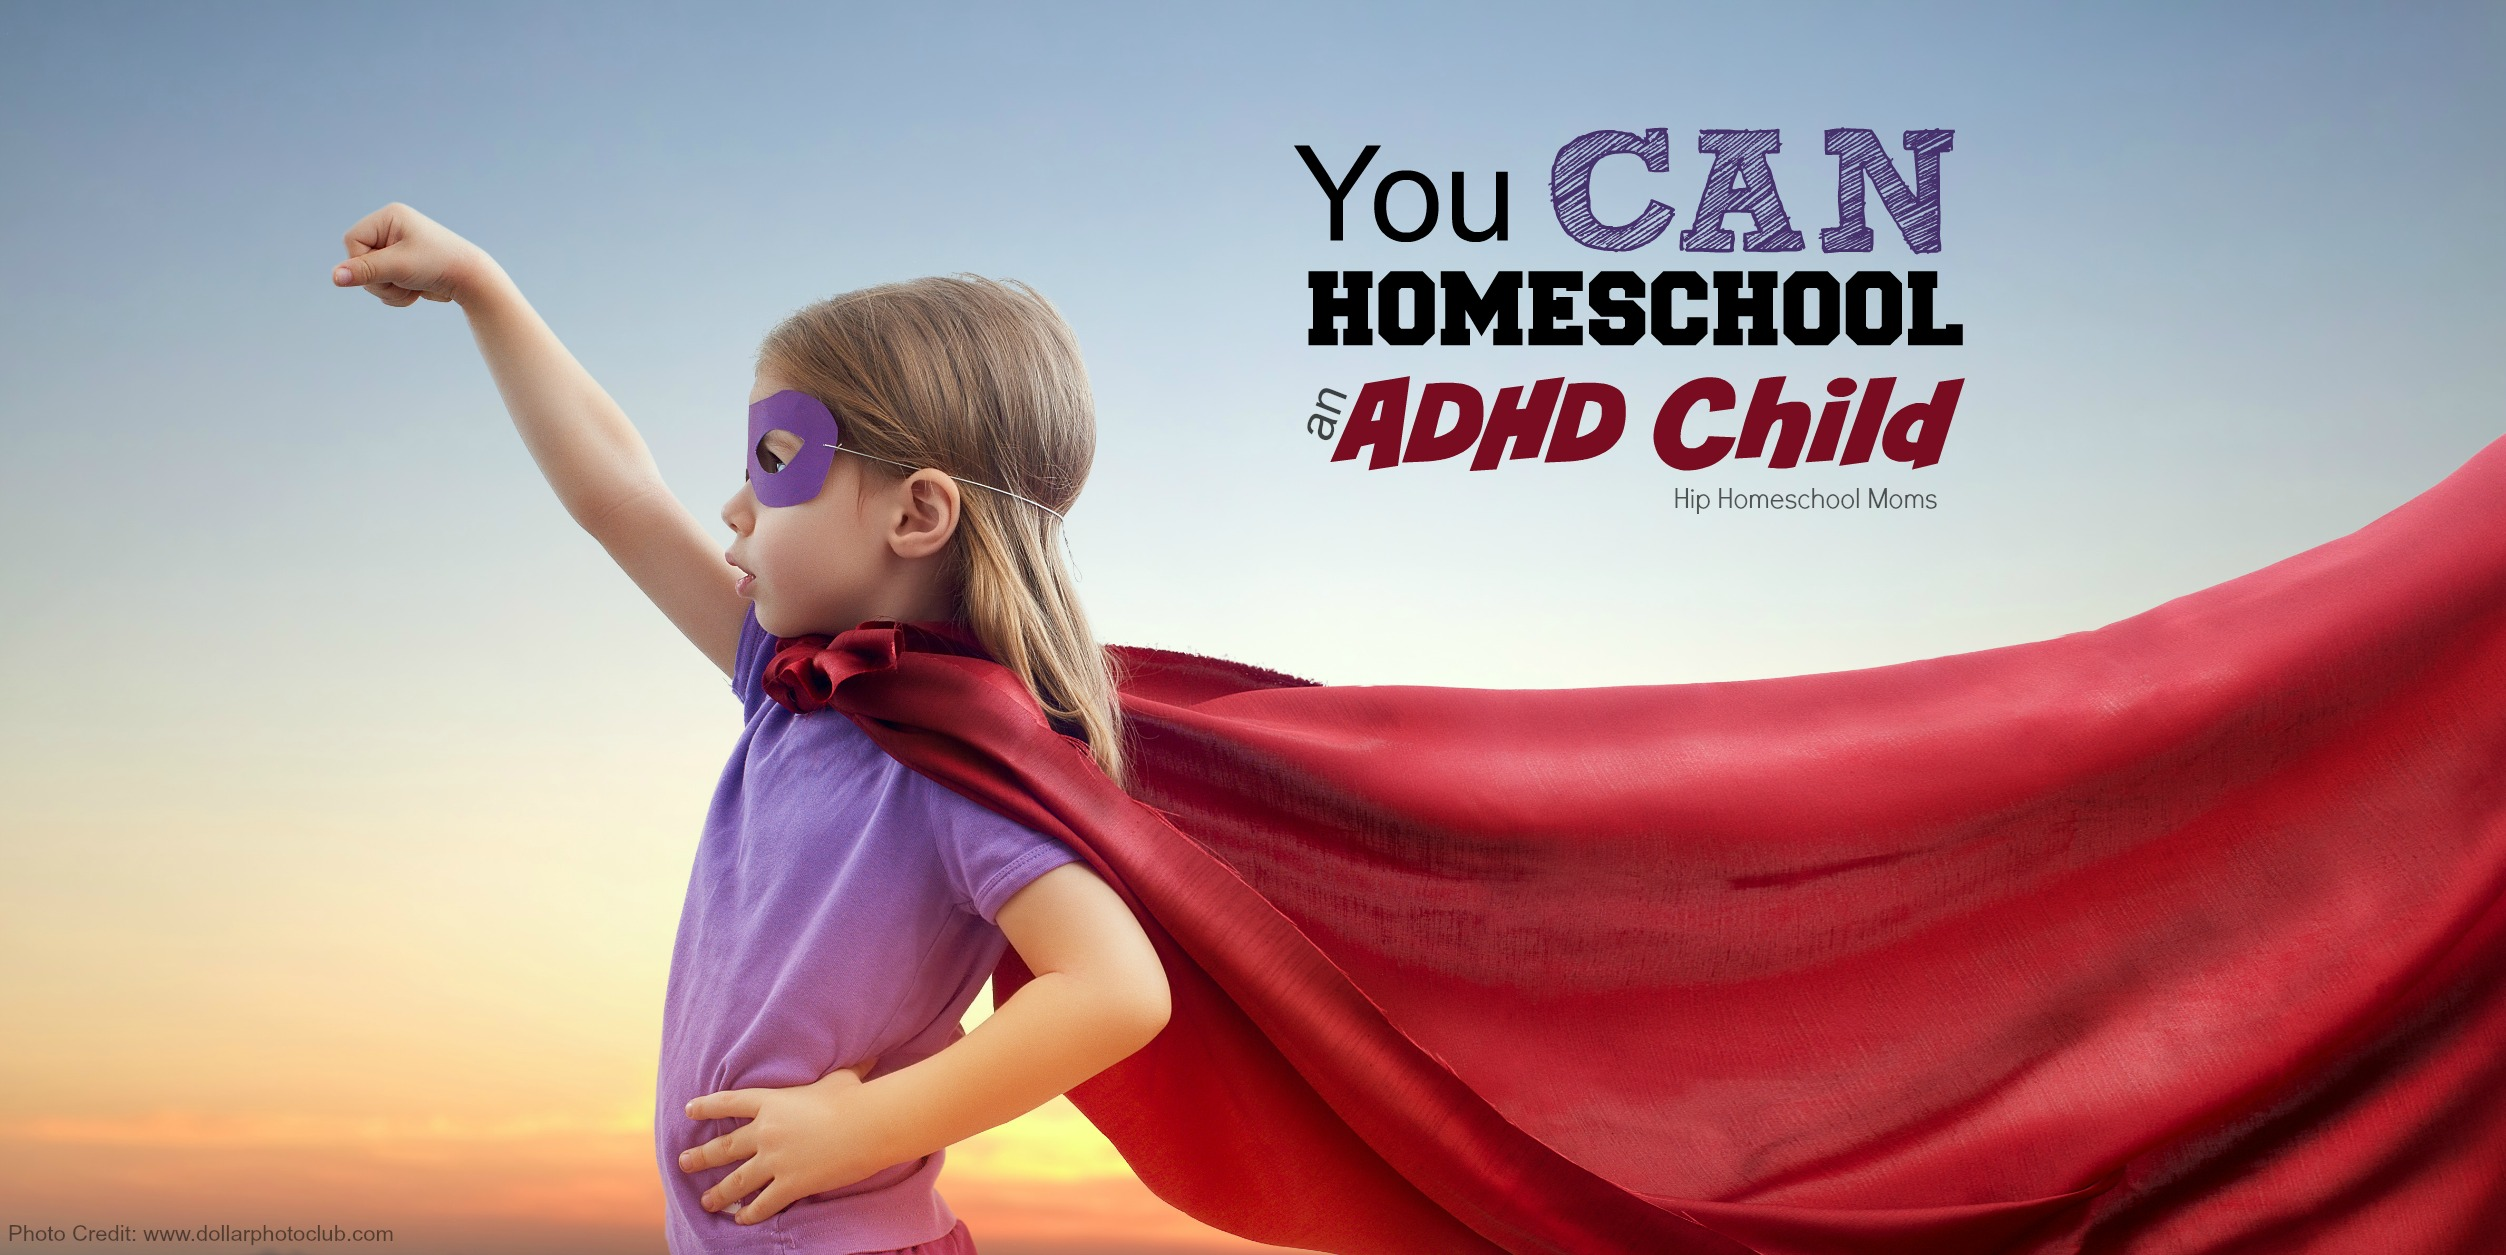 homeschool an ADHD Child